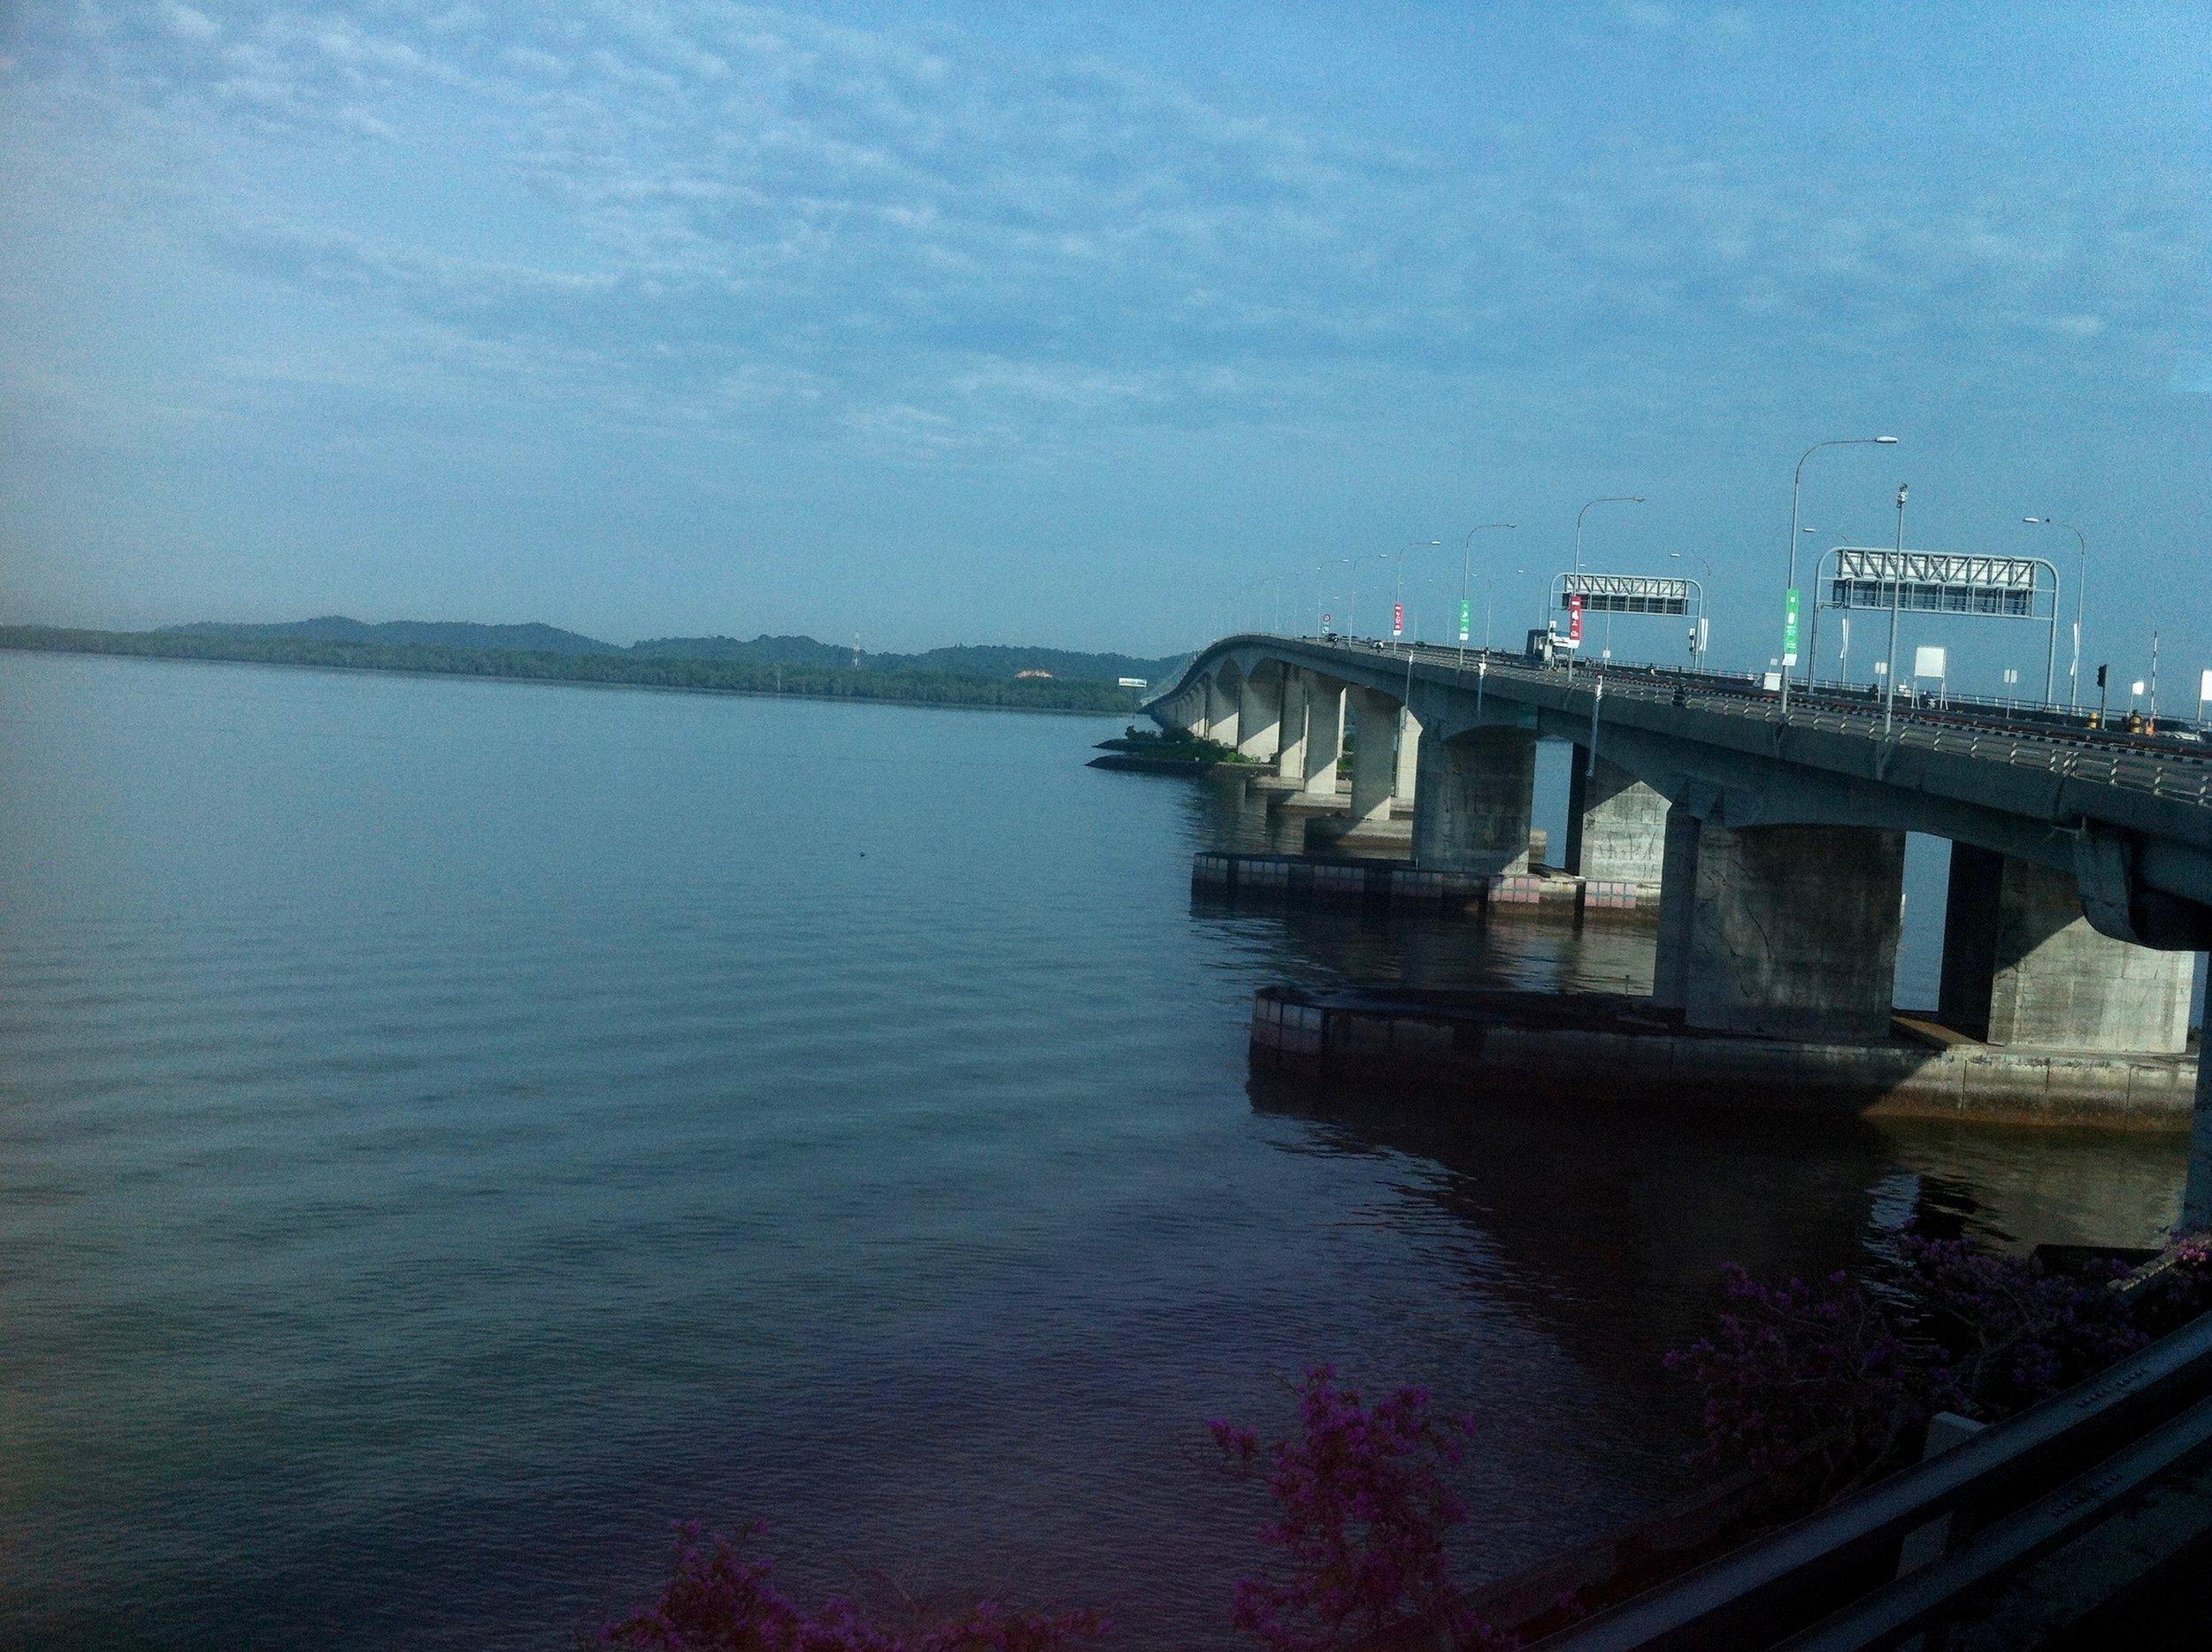 TUAS bridge crossing the Johor Strait from Singapore into Malaysia. Photo: (C) Remko Tanis